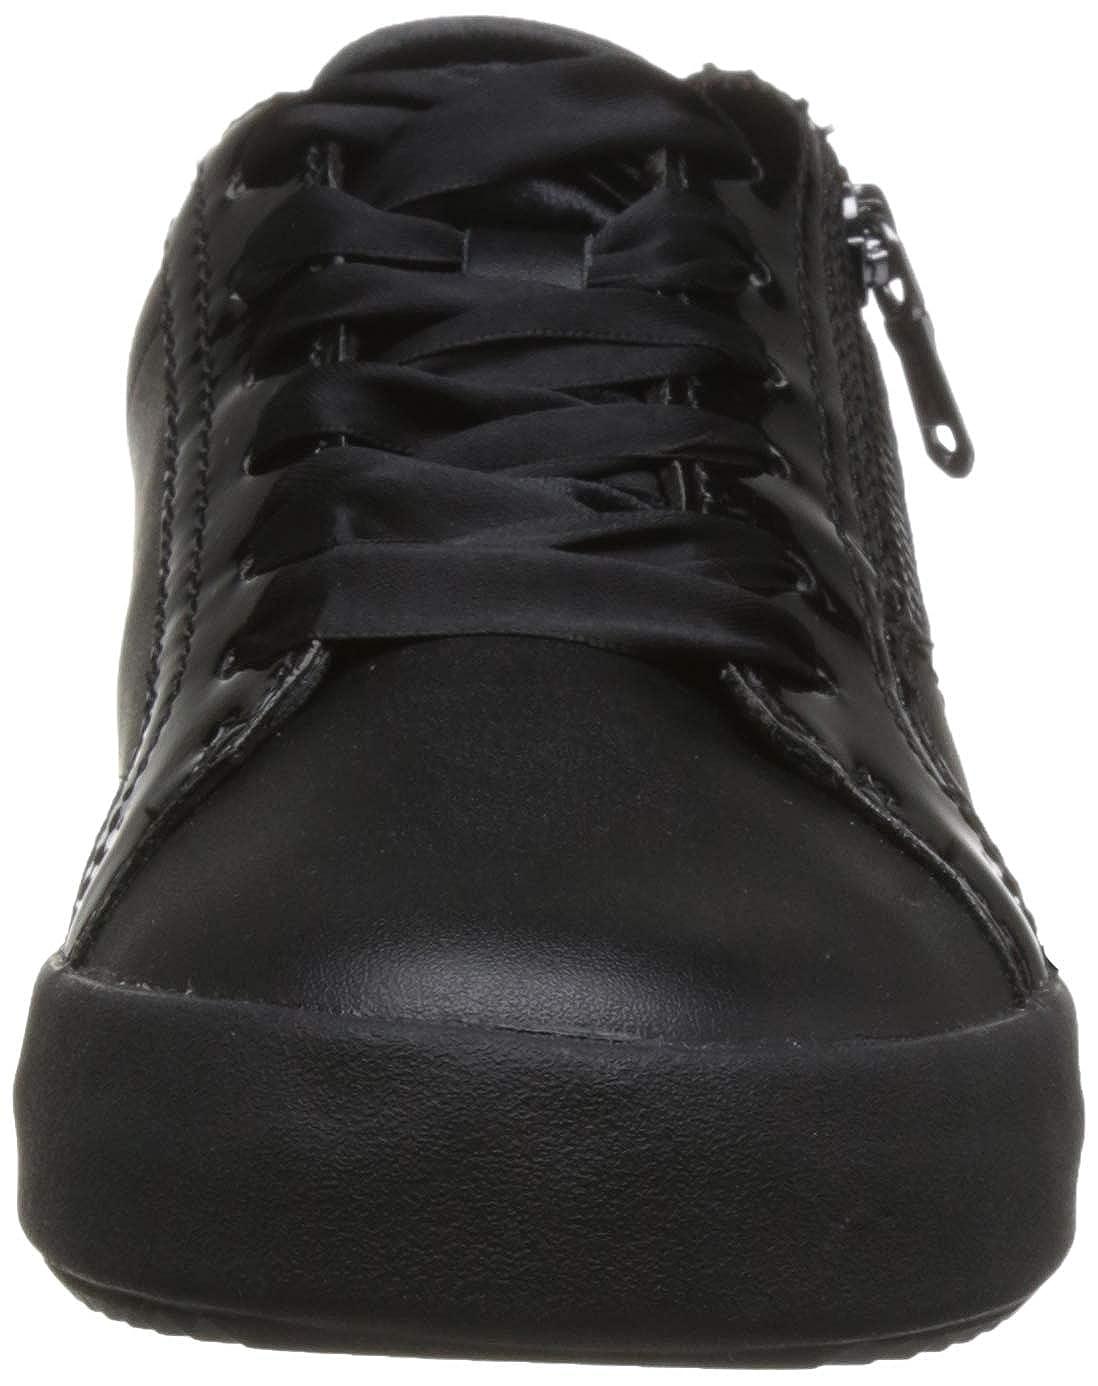 Geox Black C9999 Scarpa Donna Stringata D826HB